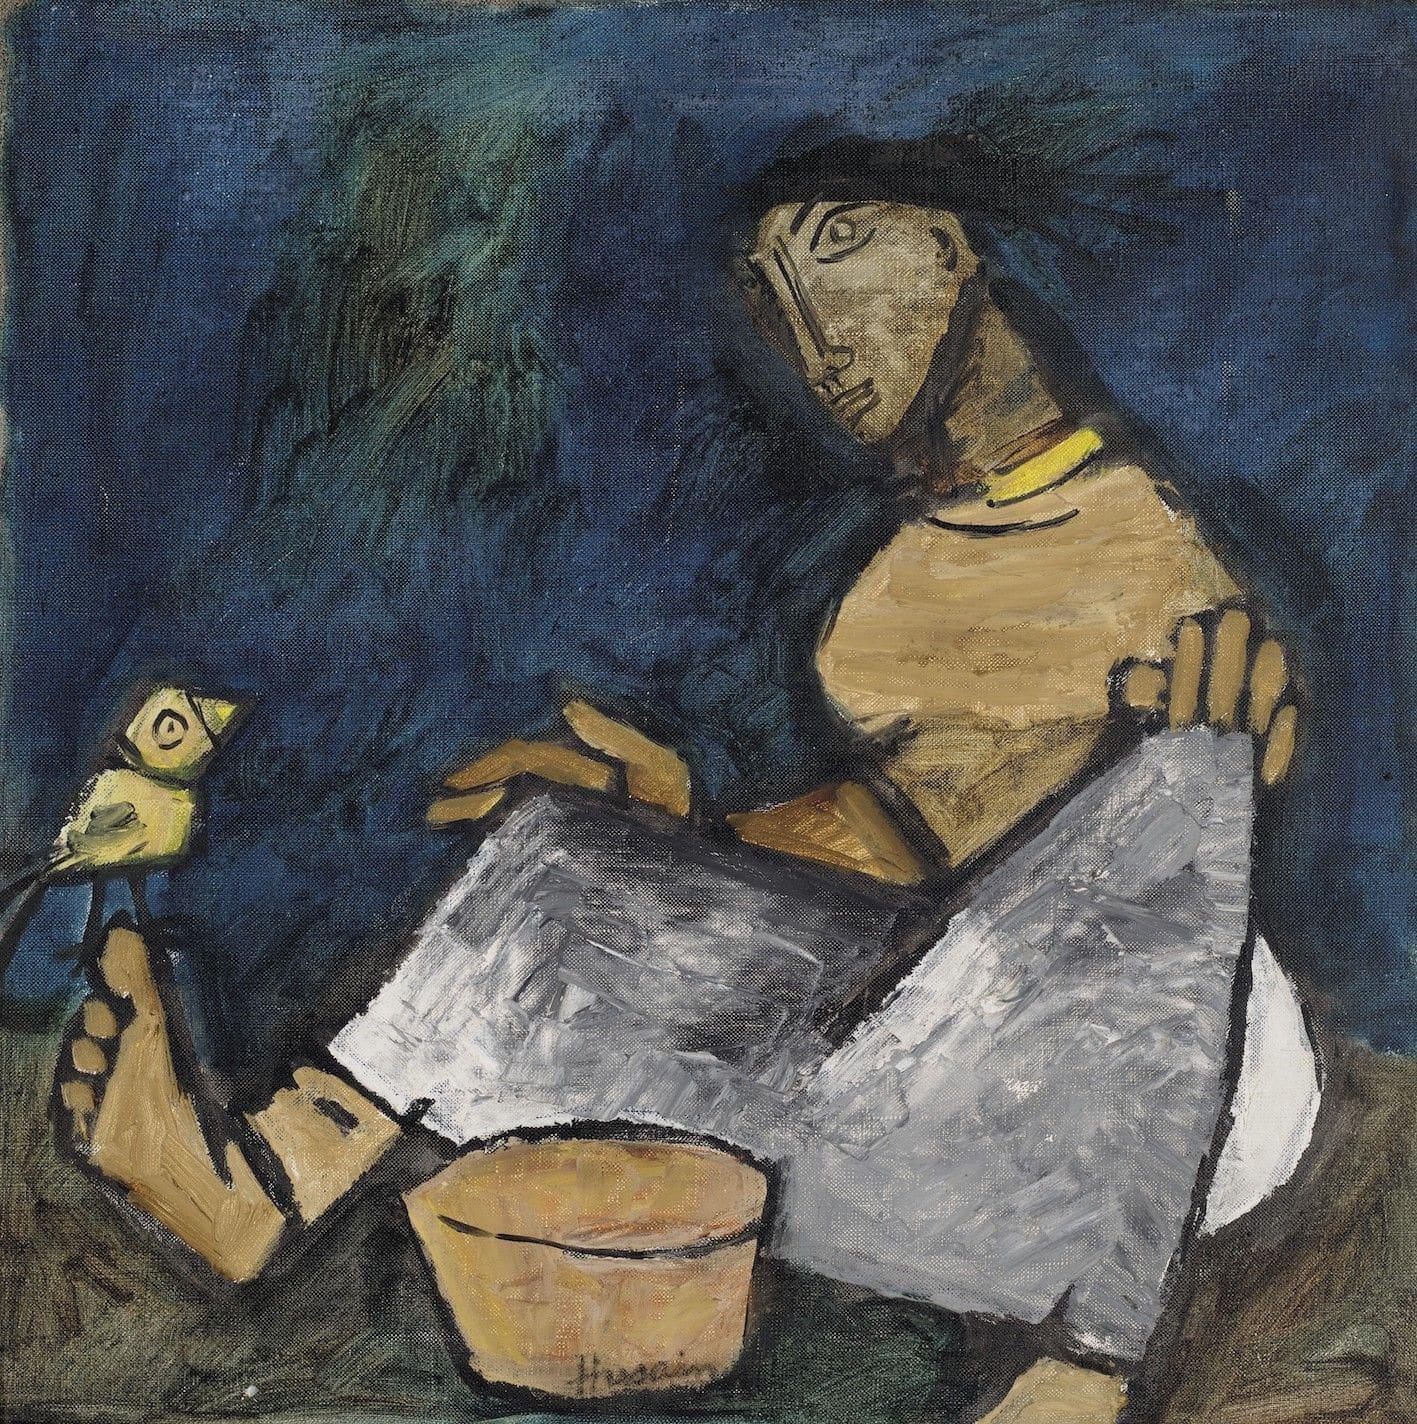 A painting by Maqbool Fida Husain.